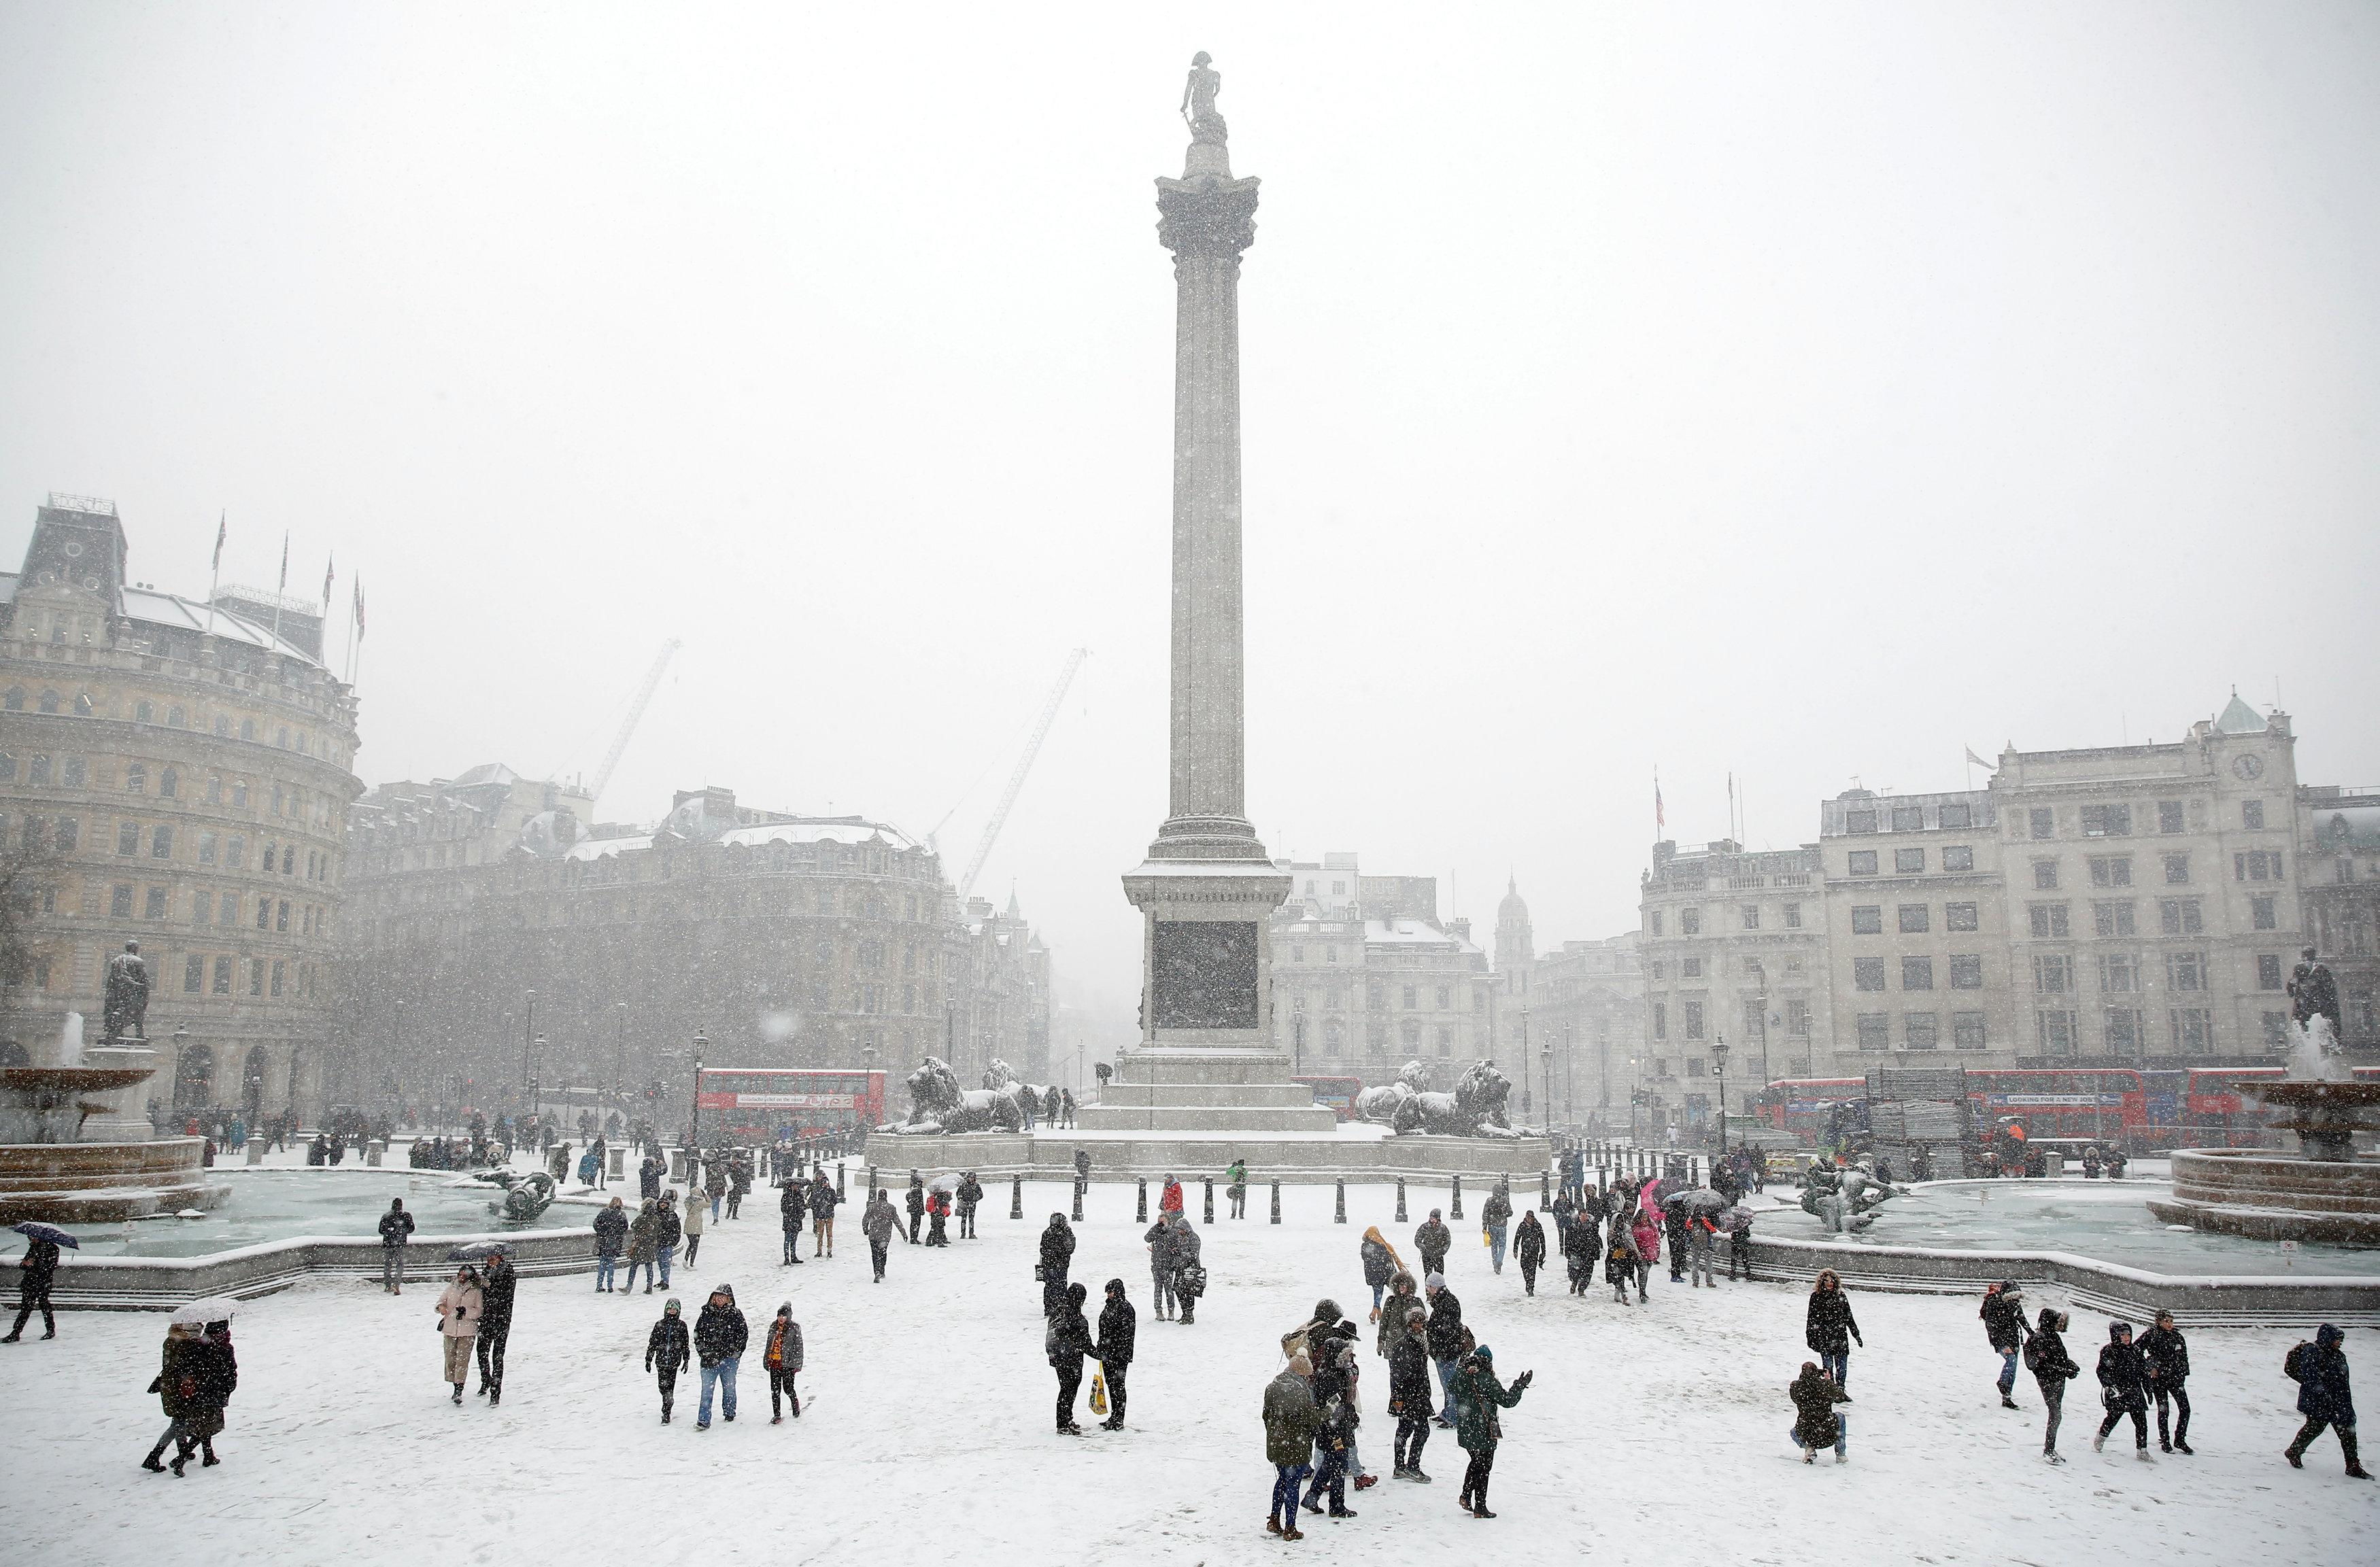 Visitors walk in the snow in Trafalgar Square, in central London, Britain March 2, 2018